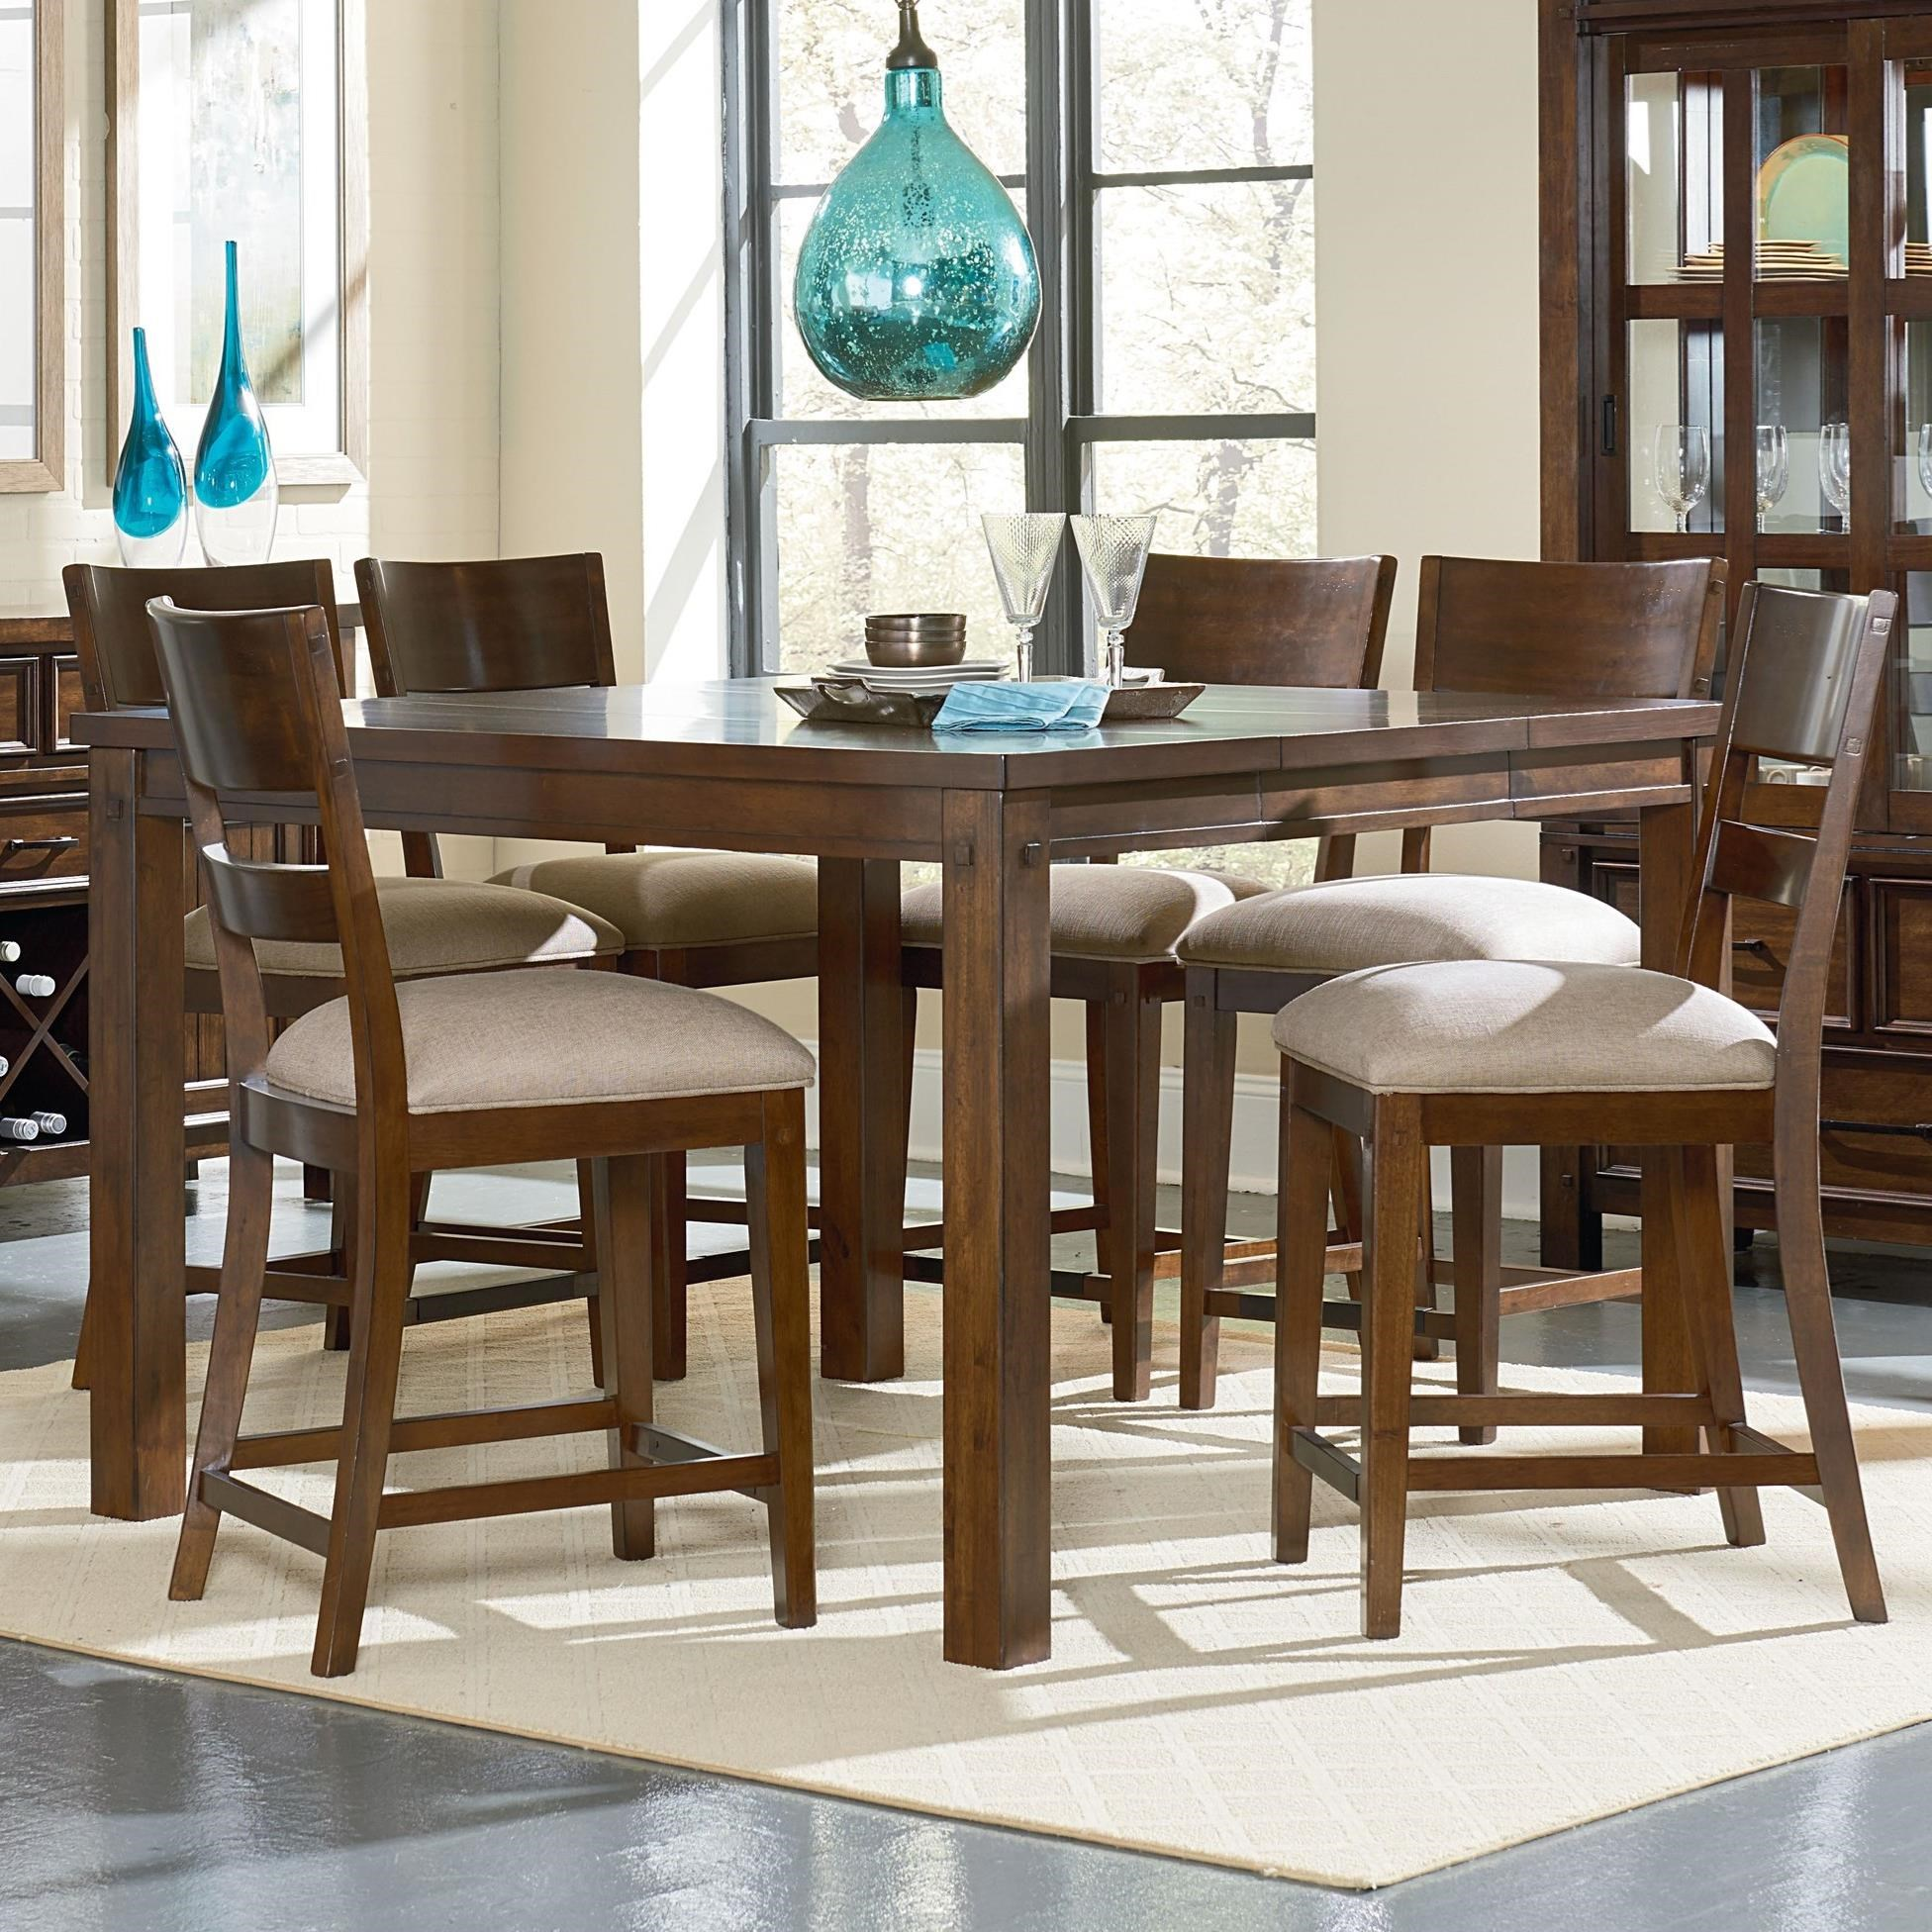 Standard Furniture Cameron Pub Table Set - Item Number: 14316+3x14314